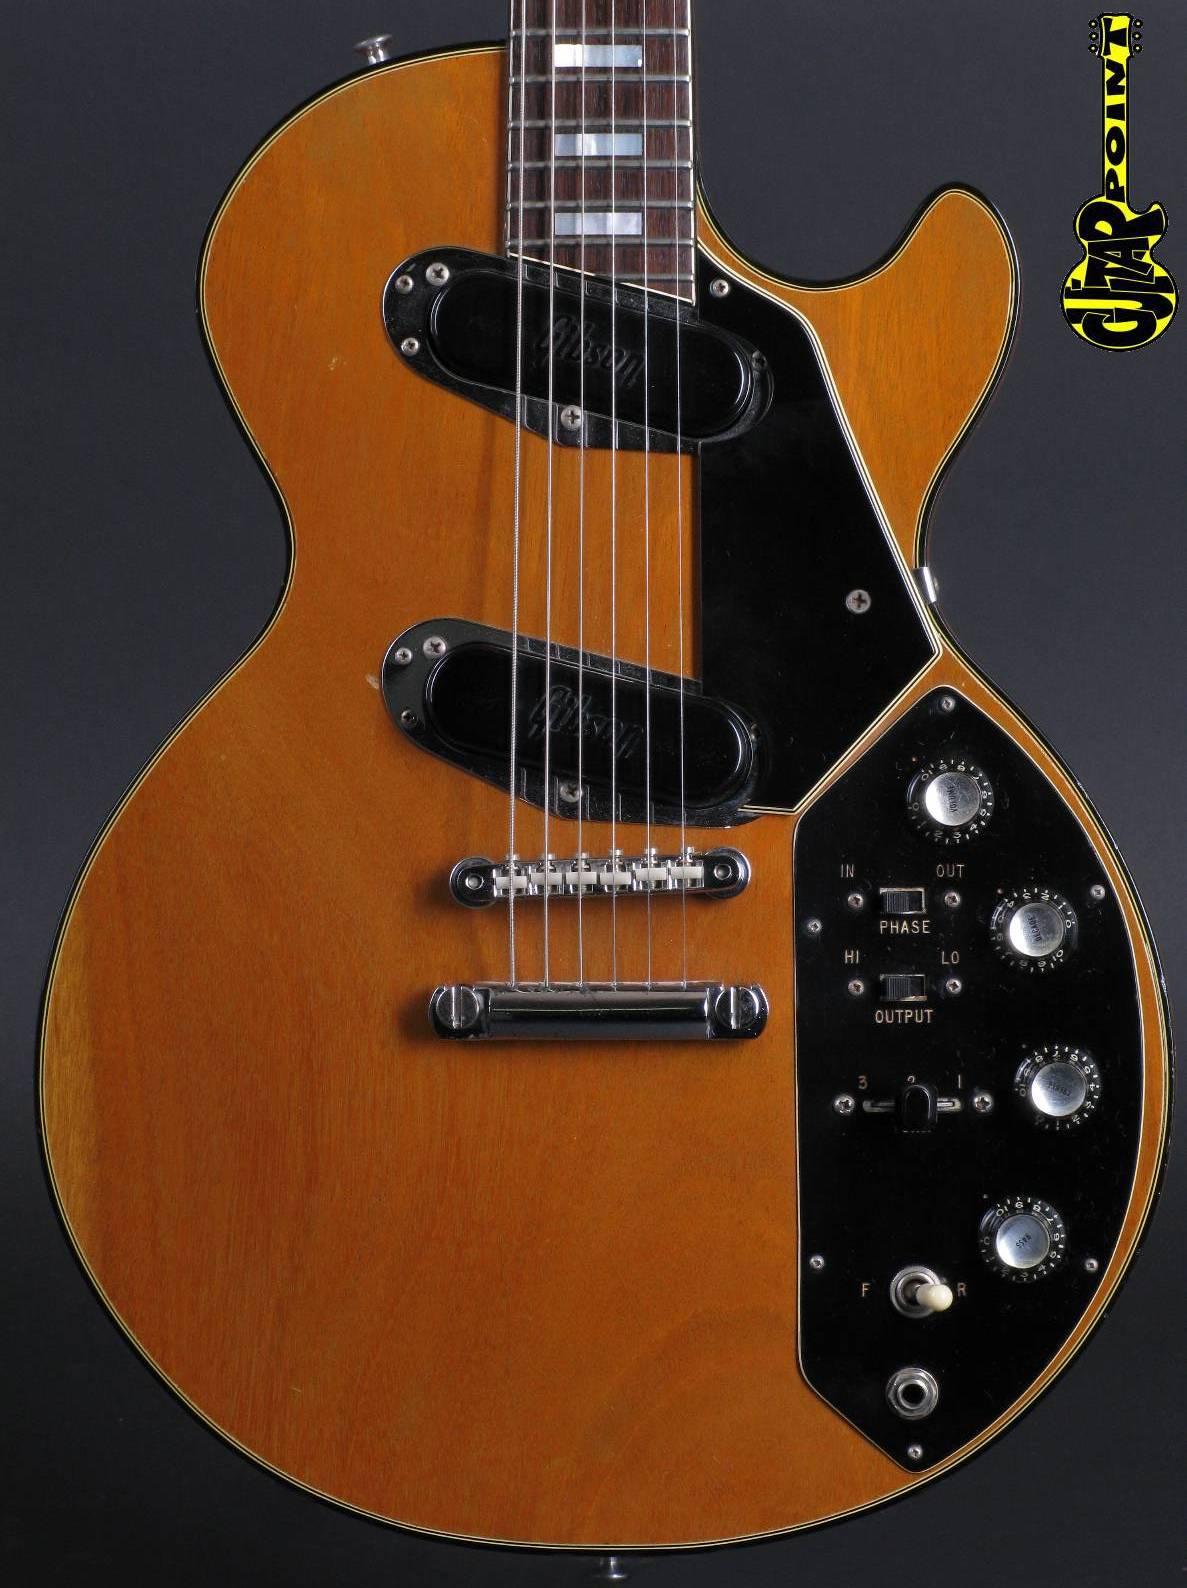 1972 Gibson Les Paul Recording - Natural